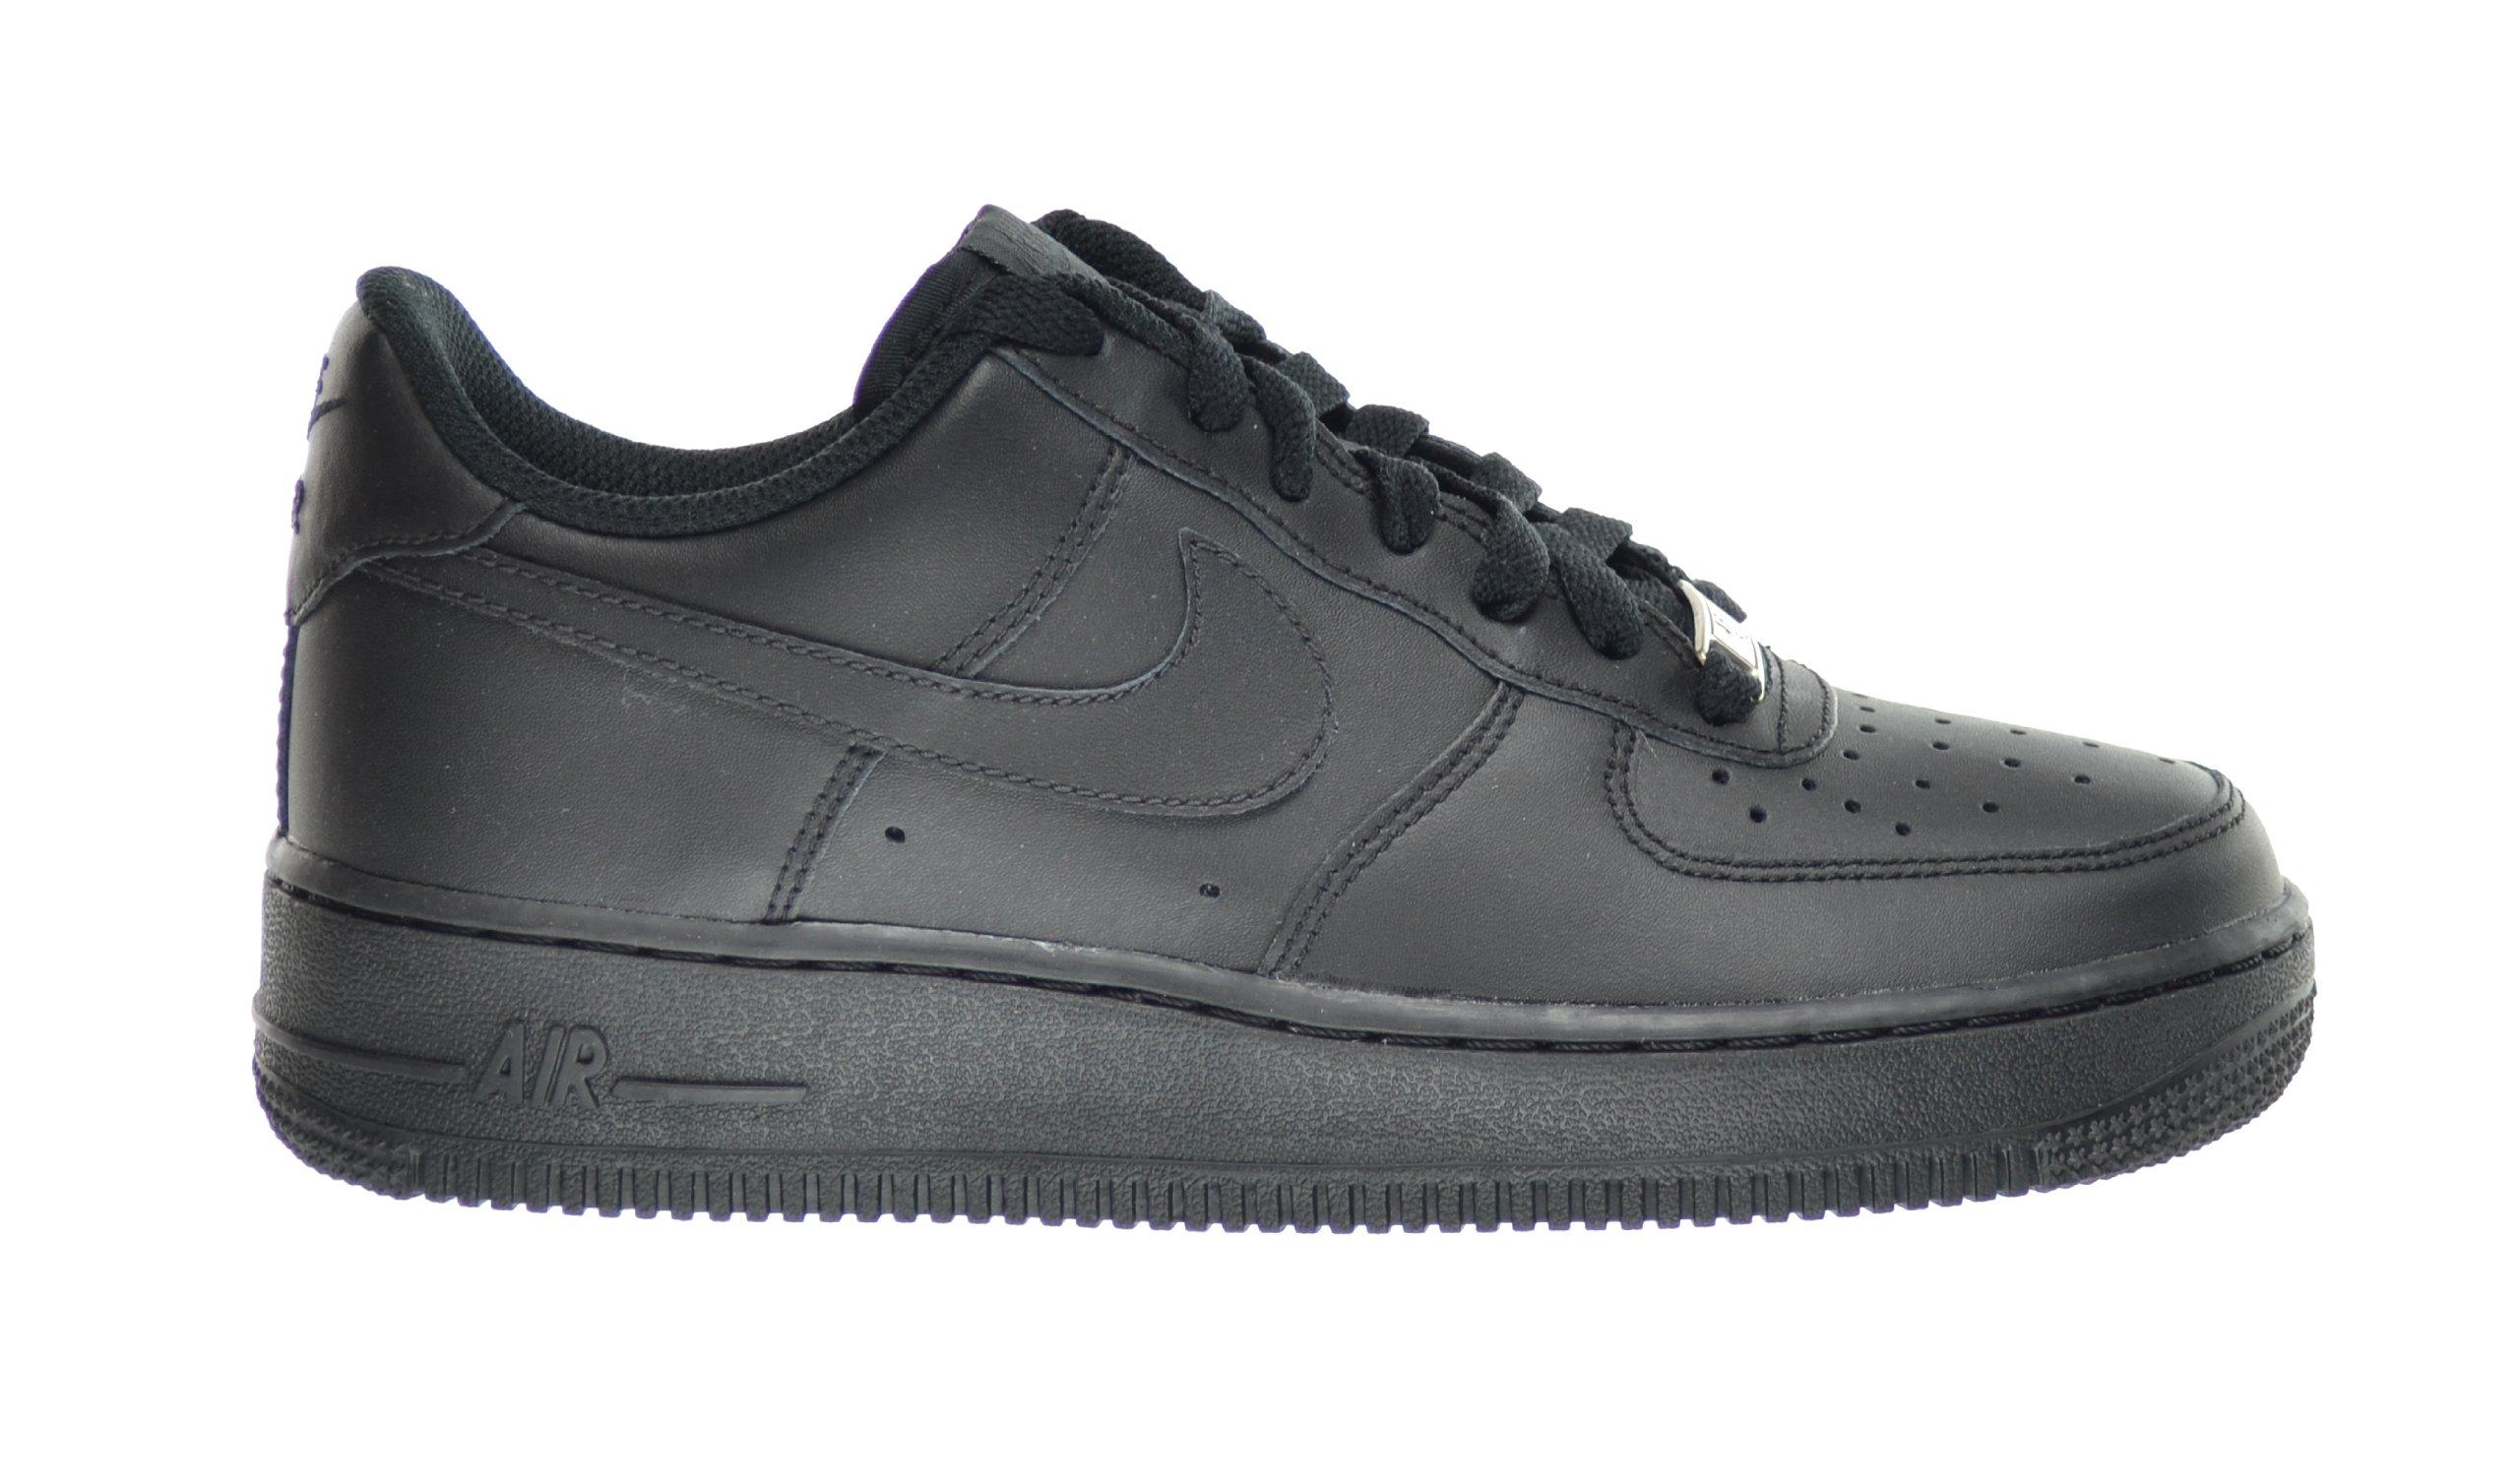 63c3e0559e Galleon - Nike Air Force 1 (GS) Big Kids Sneakers Black 314192-009 ...